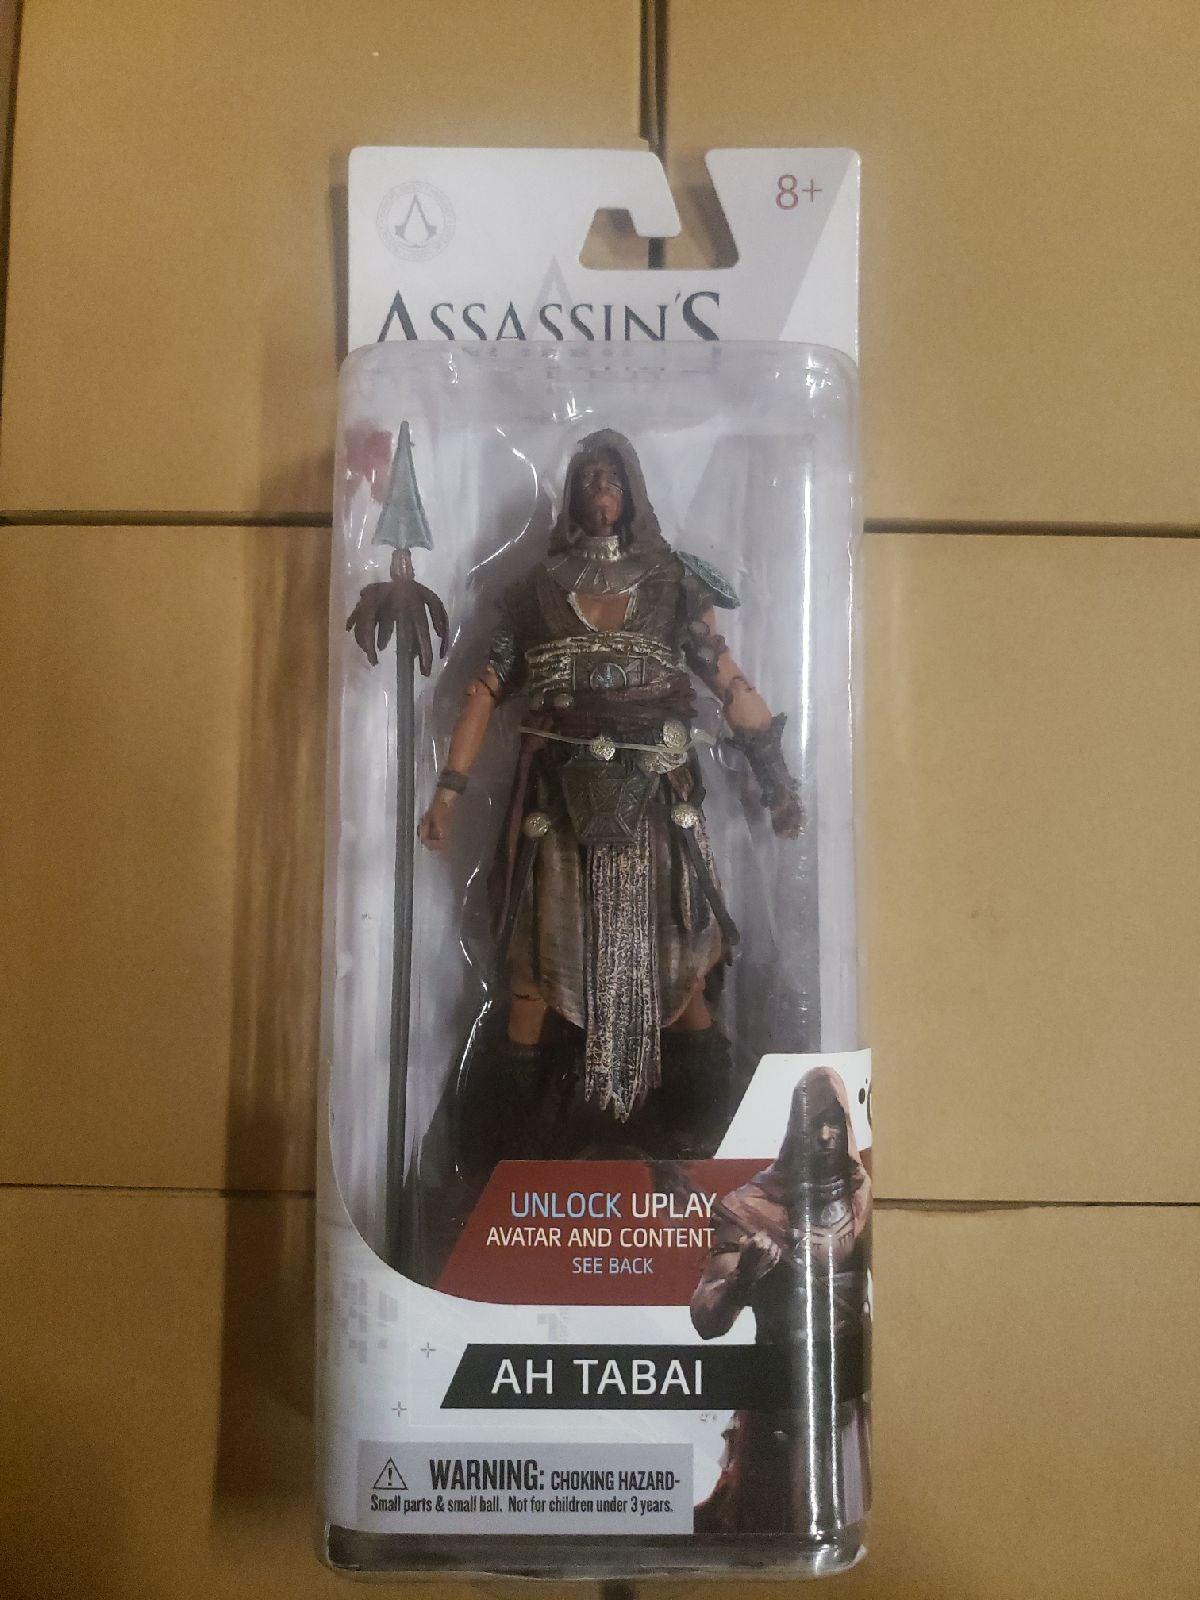 Assassin's Creed Ah Tabai figure